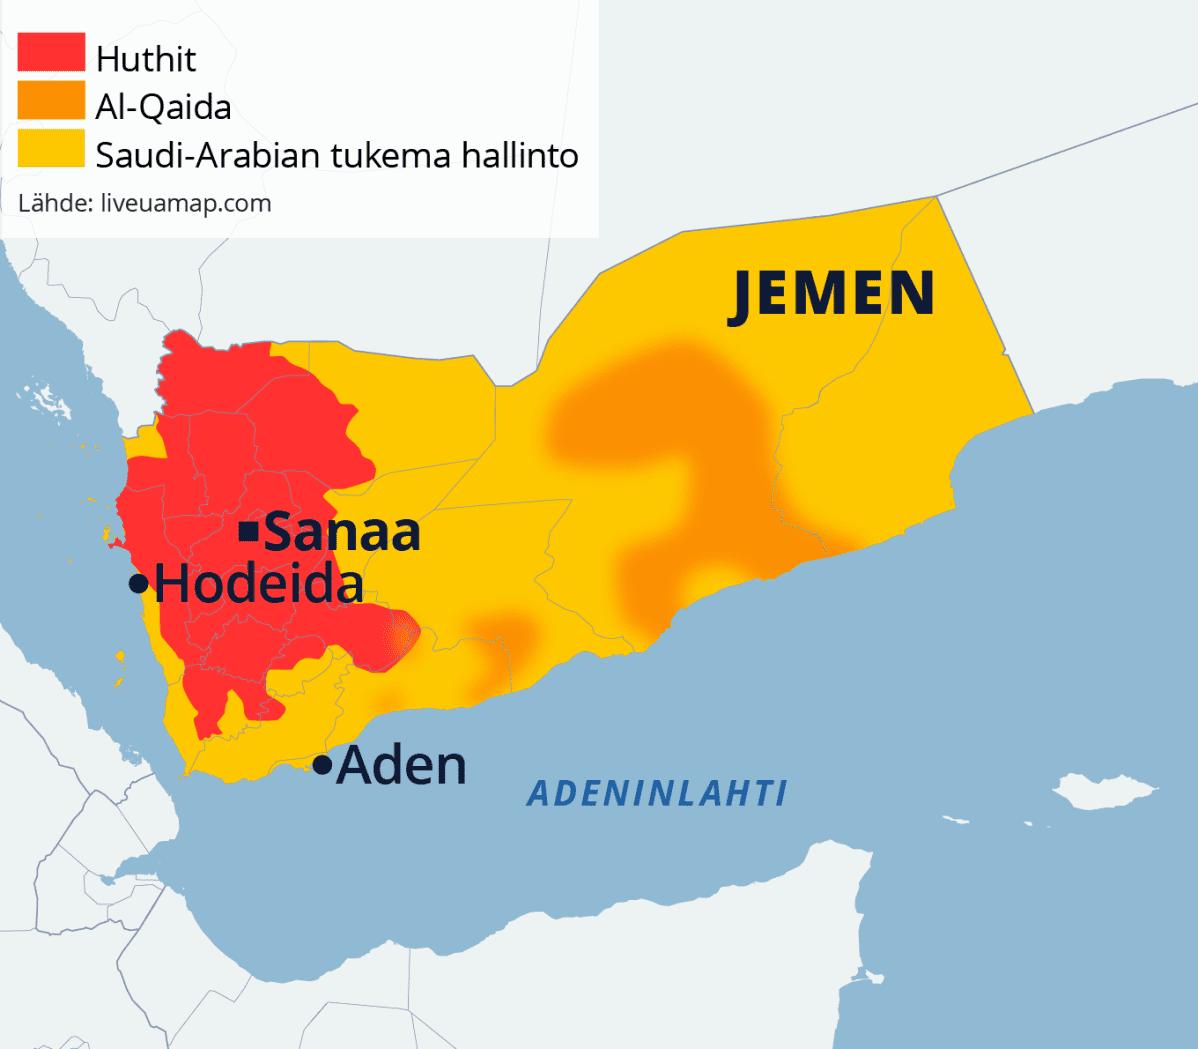 Kartta Jemenin eri osapuolista.